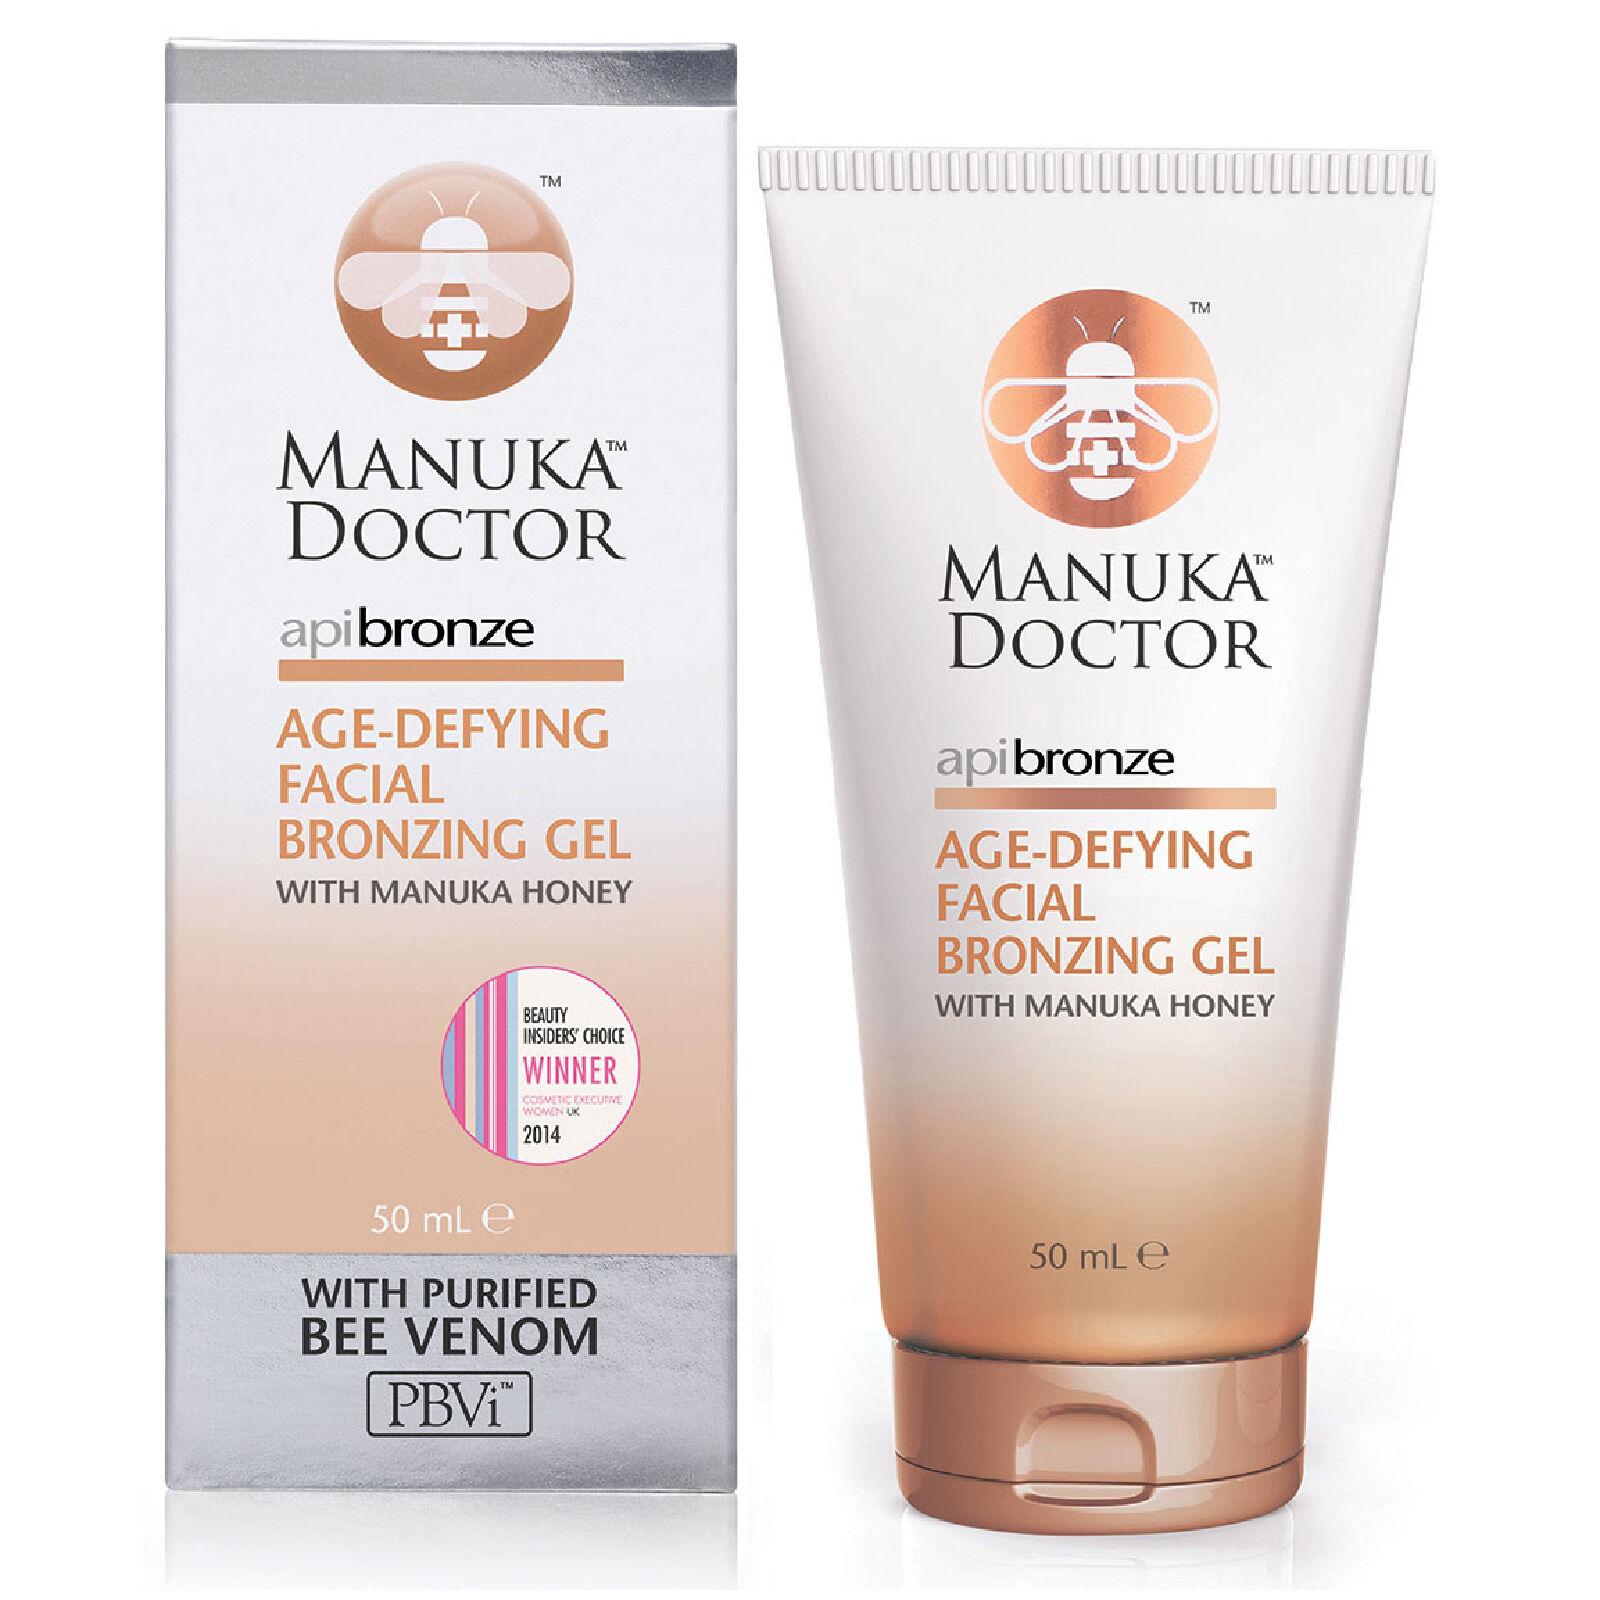 Manuka Doctor Gel bronzant anti-âge pour le visageApiBronzeManuka Doctor 50 ml